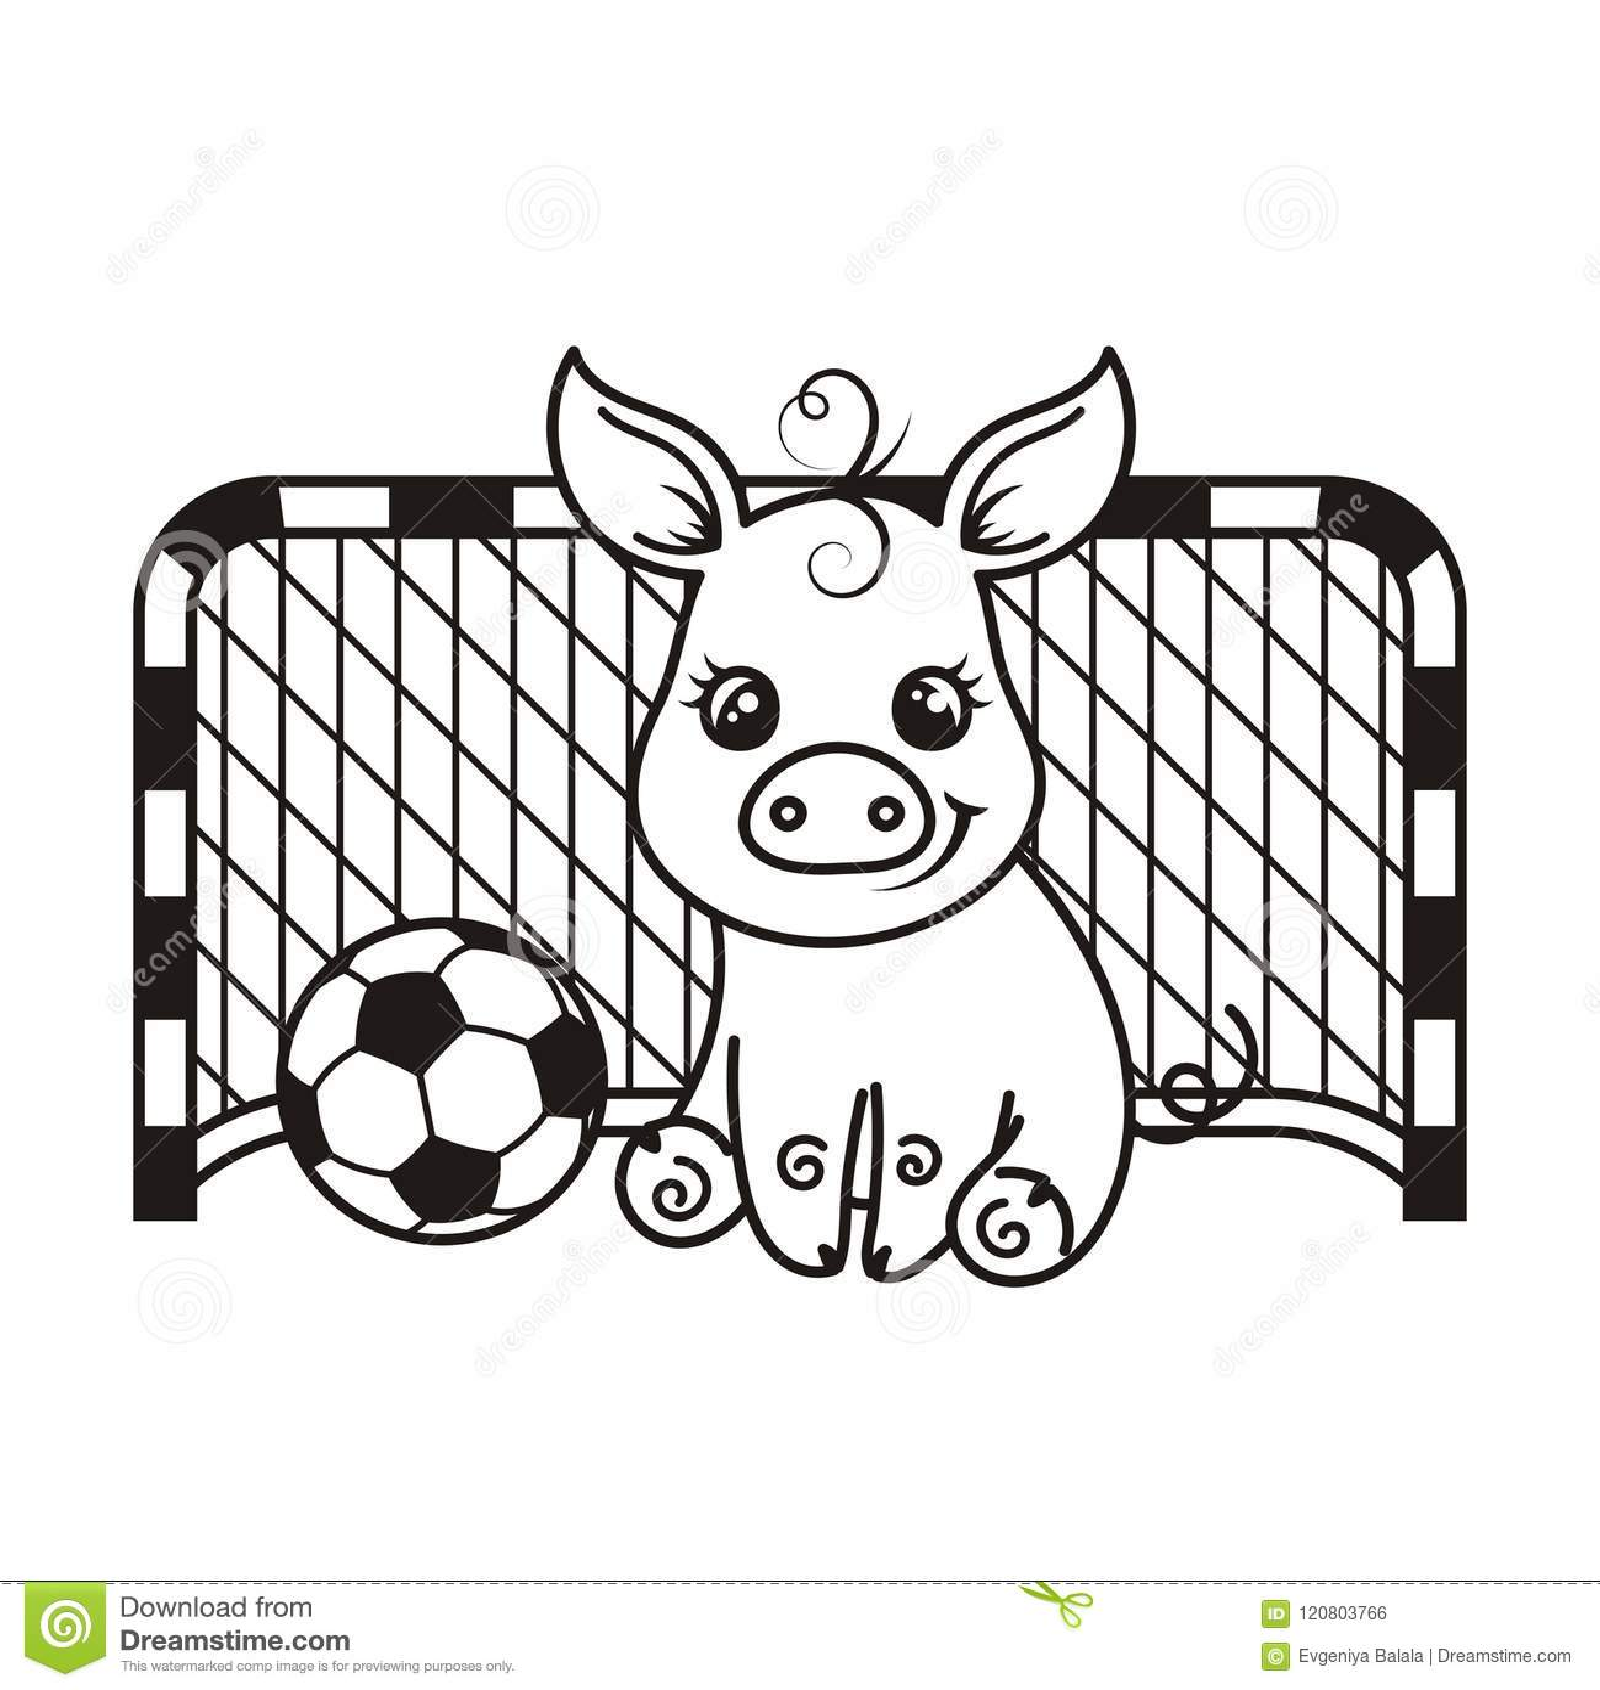 Cute Cartoon Pig With A Soccer Ball. Vector Illustration. Stock ...